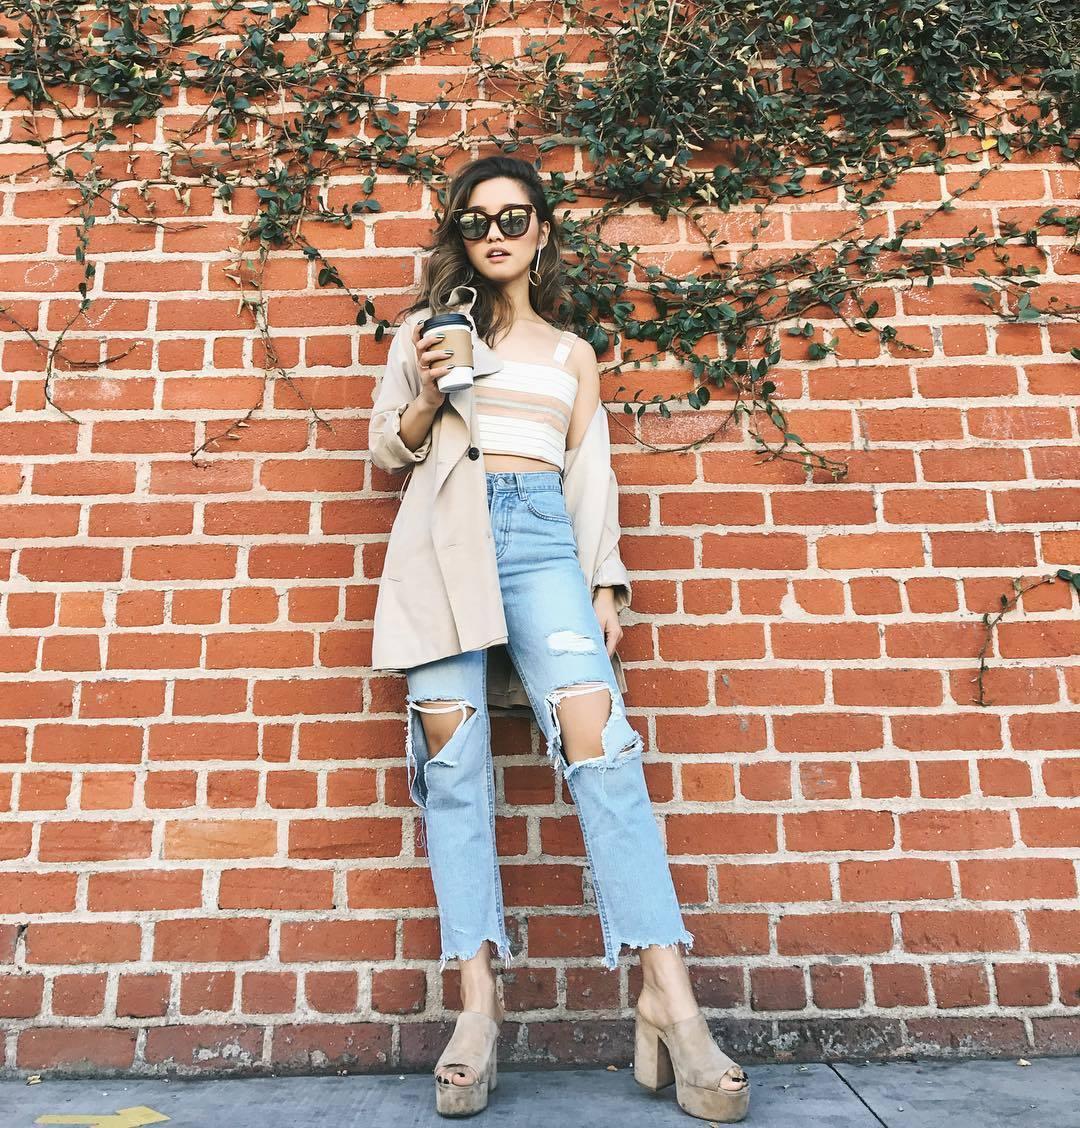 jenn im quần jeans rách và áo crop top